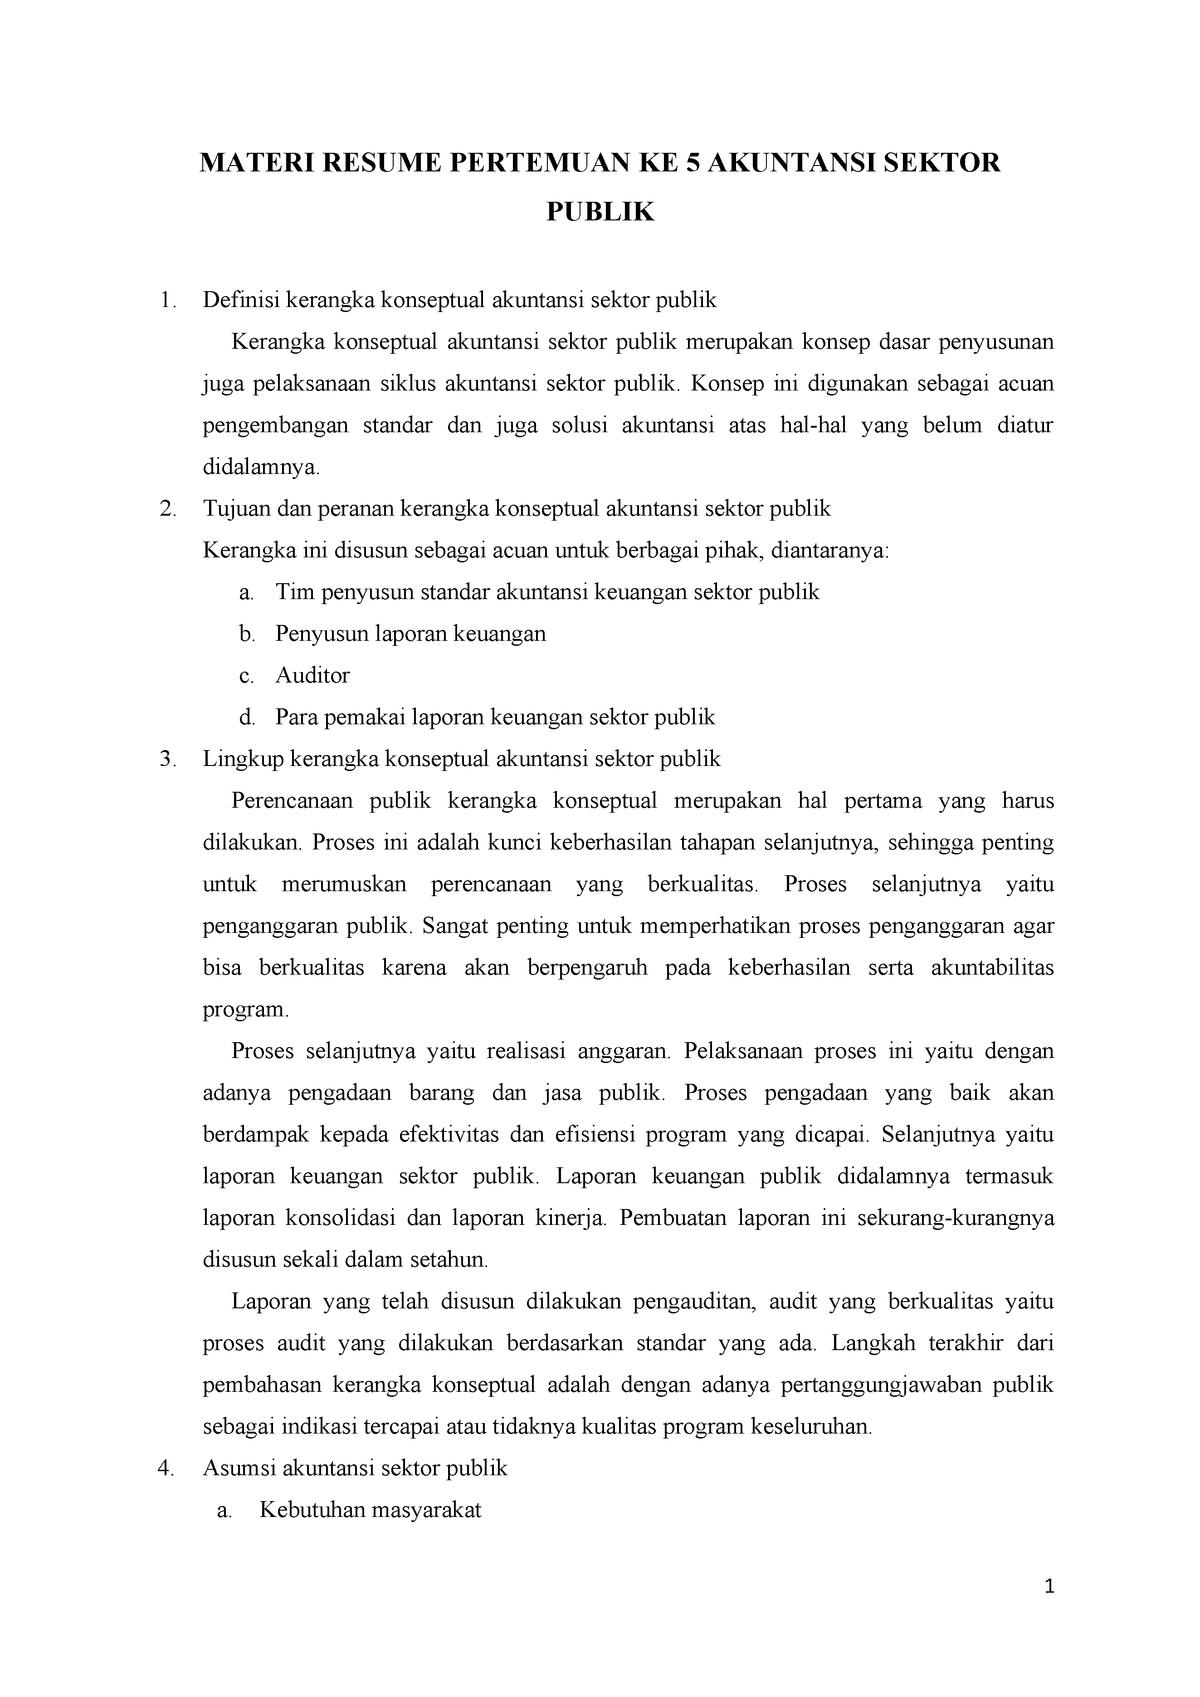 Kerangka Konseptual Akuntansi Sektor Publik Studocu